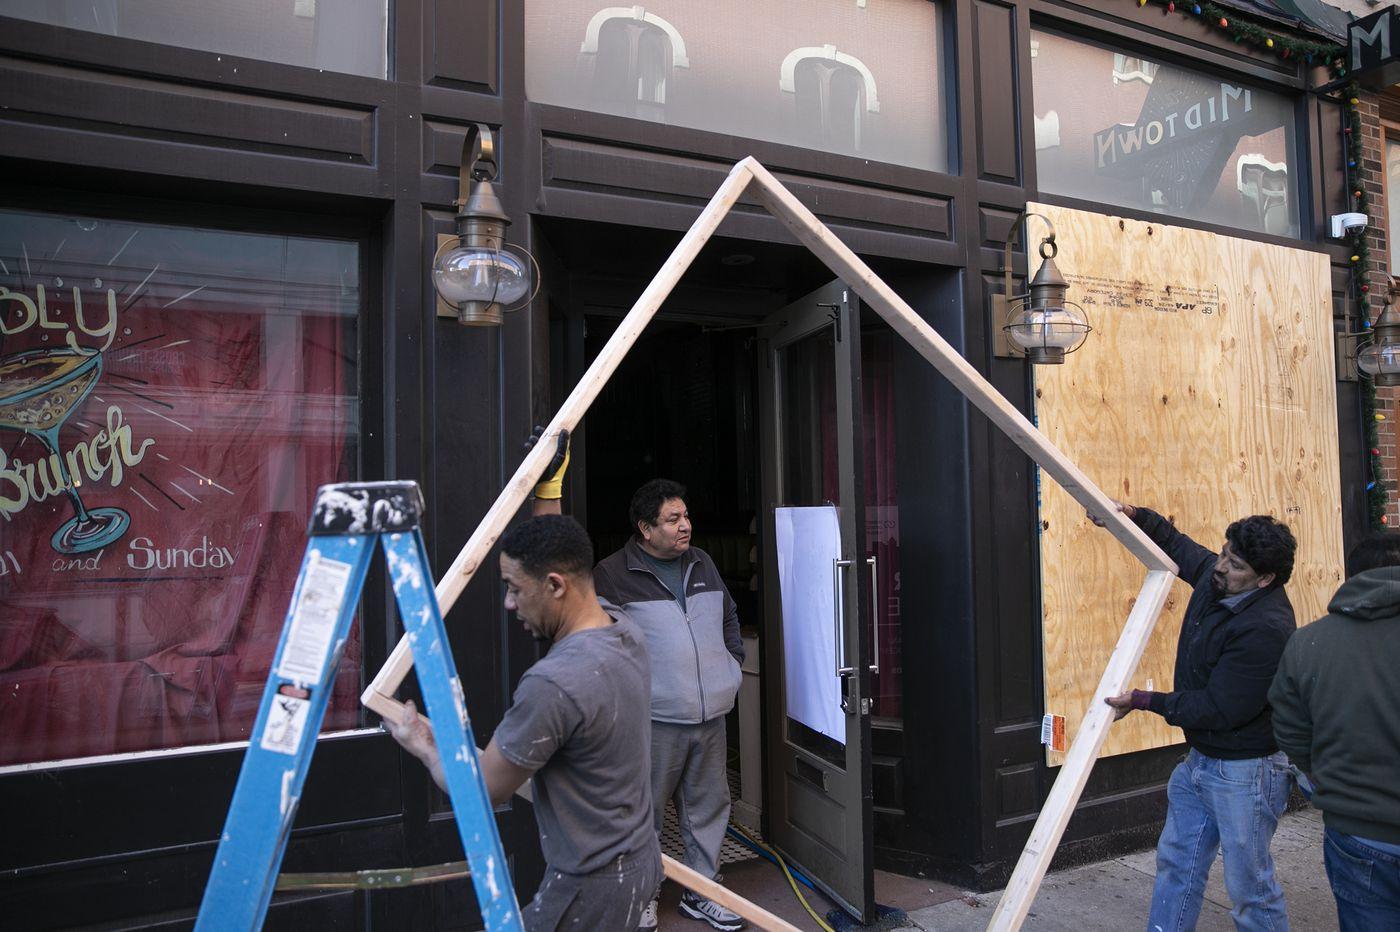 Fearing 'desperate people' during coronavirus shutdown, bar owner boards up windows in Center City